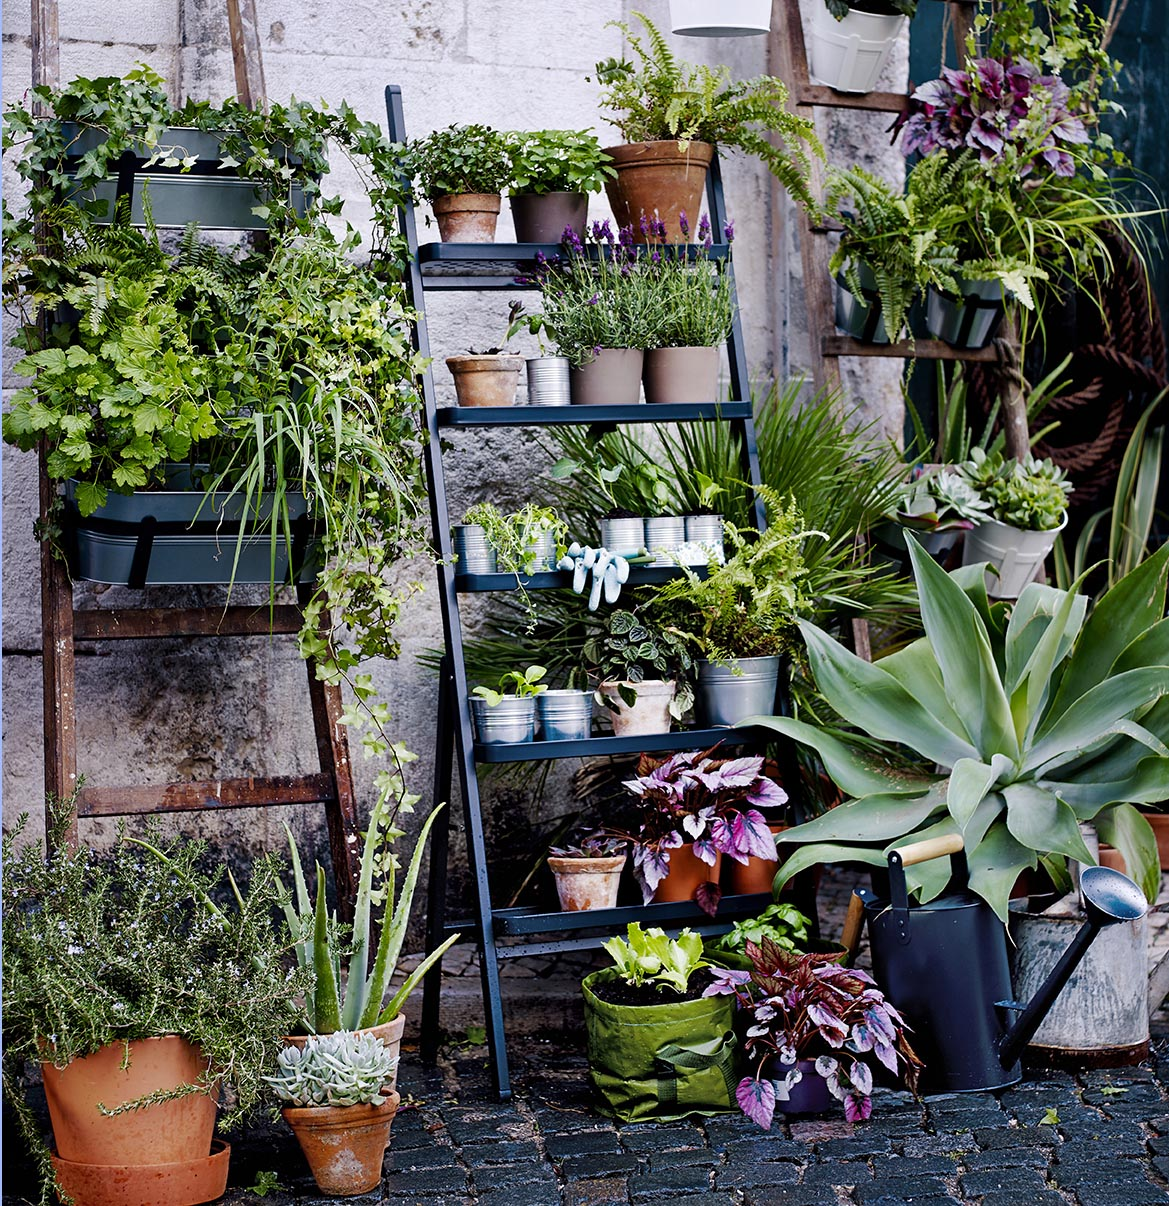 Plante i liten hage